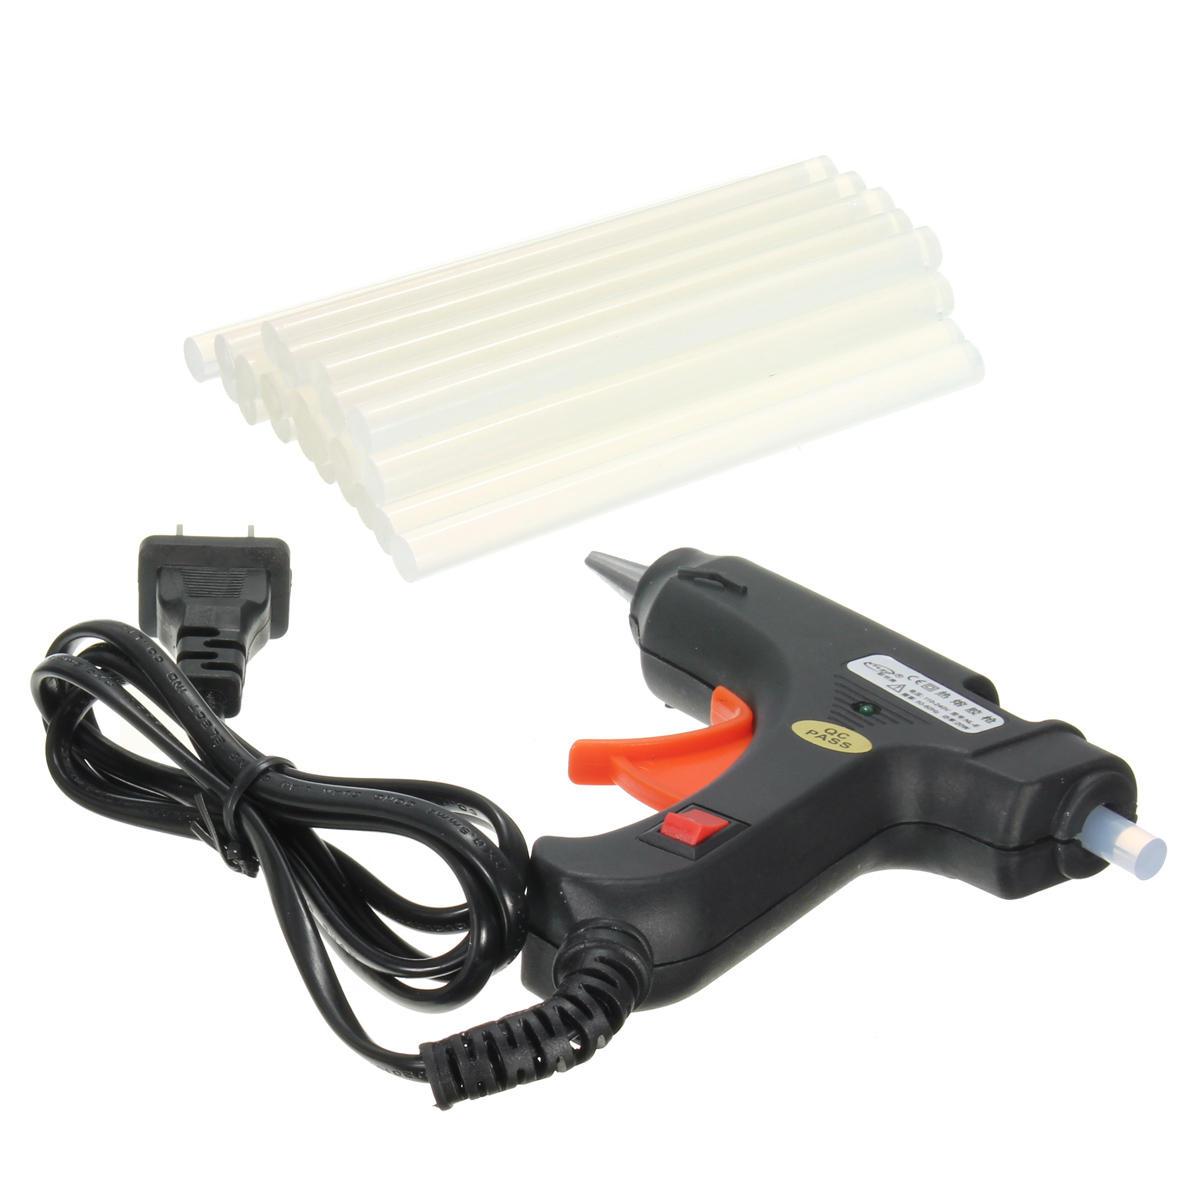 Electric 20w Hot Melt Art Craft Glue Gun With 50pcs Free Mini Clear